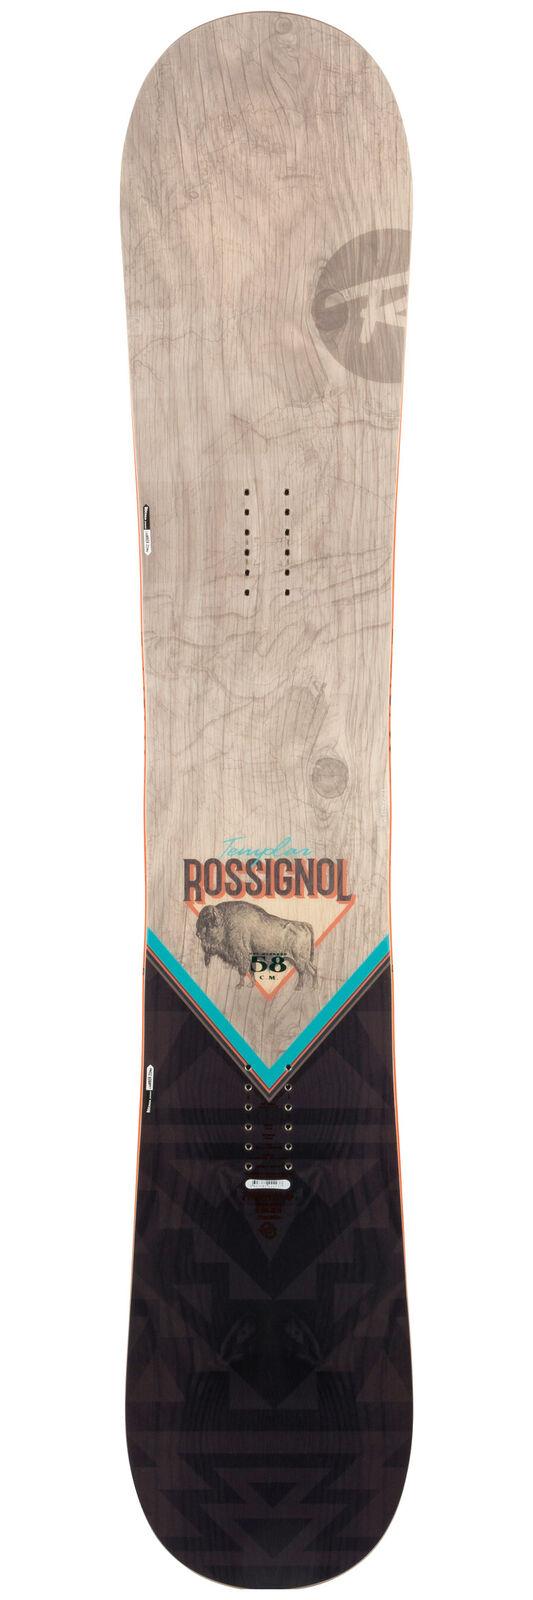 Rossignol Templar Wide Snowboard - 159cm  2019